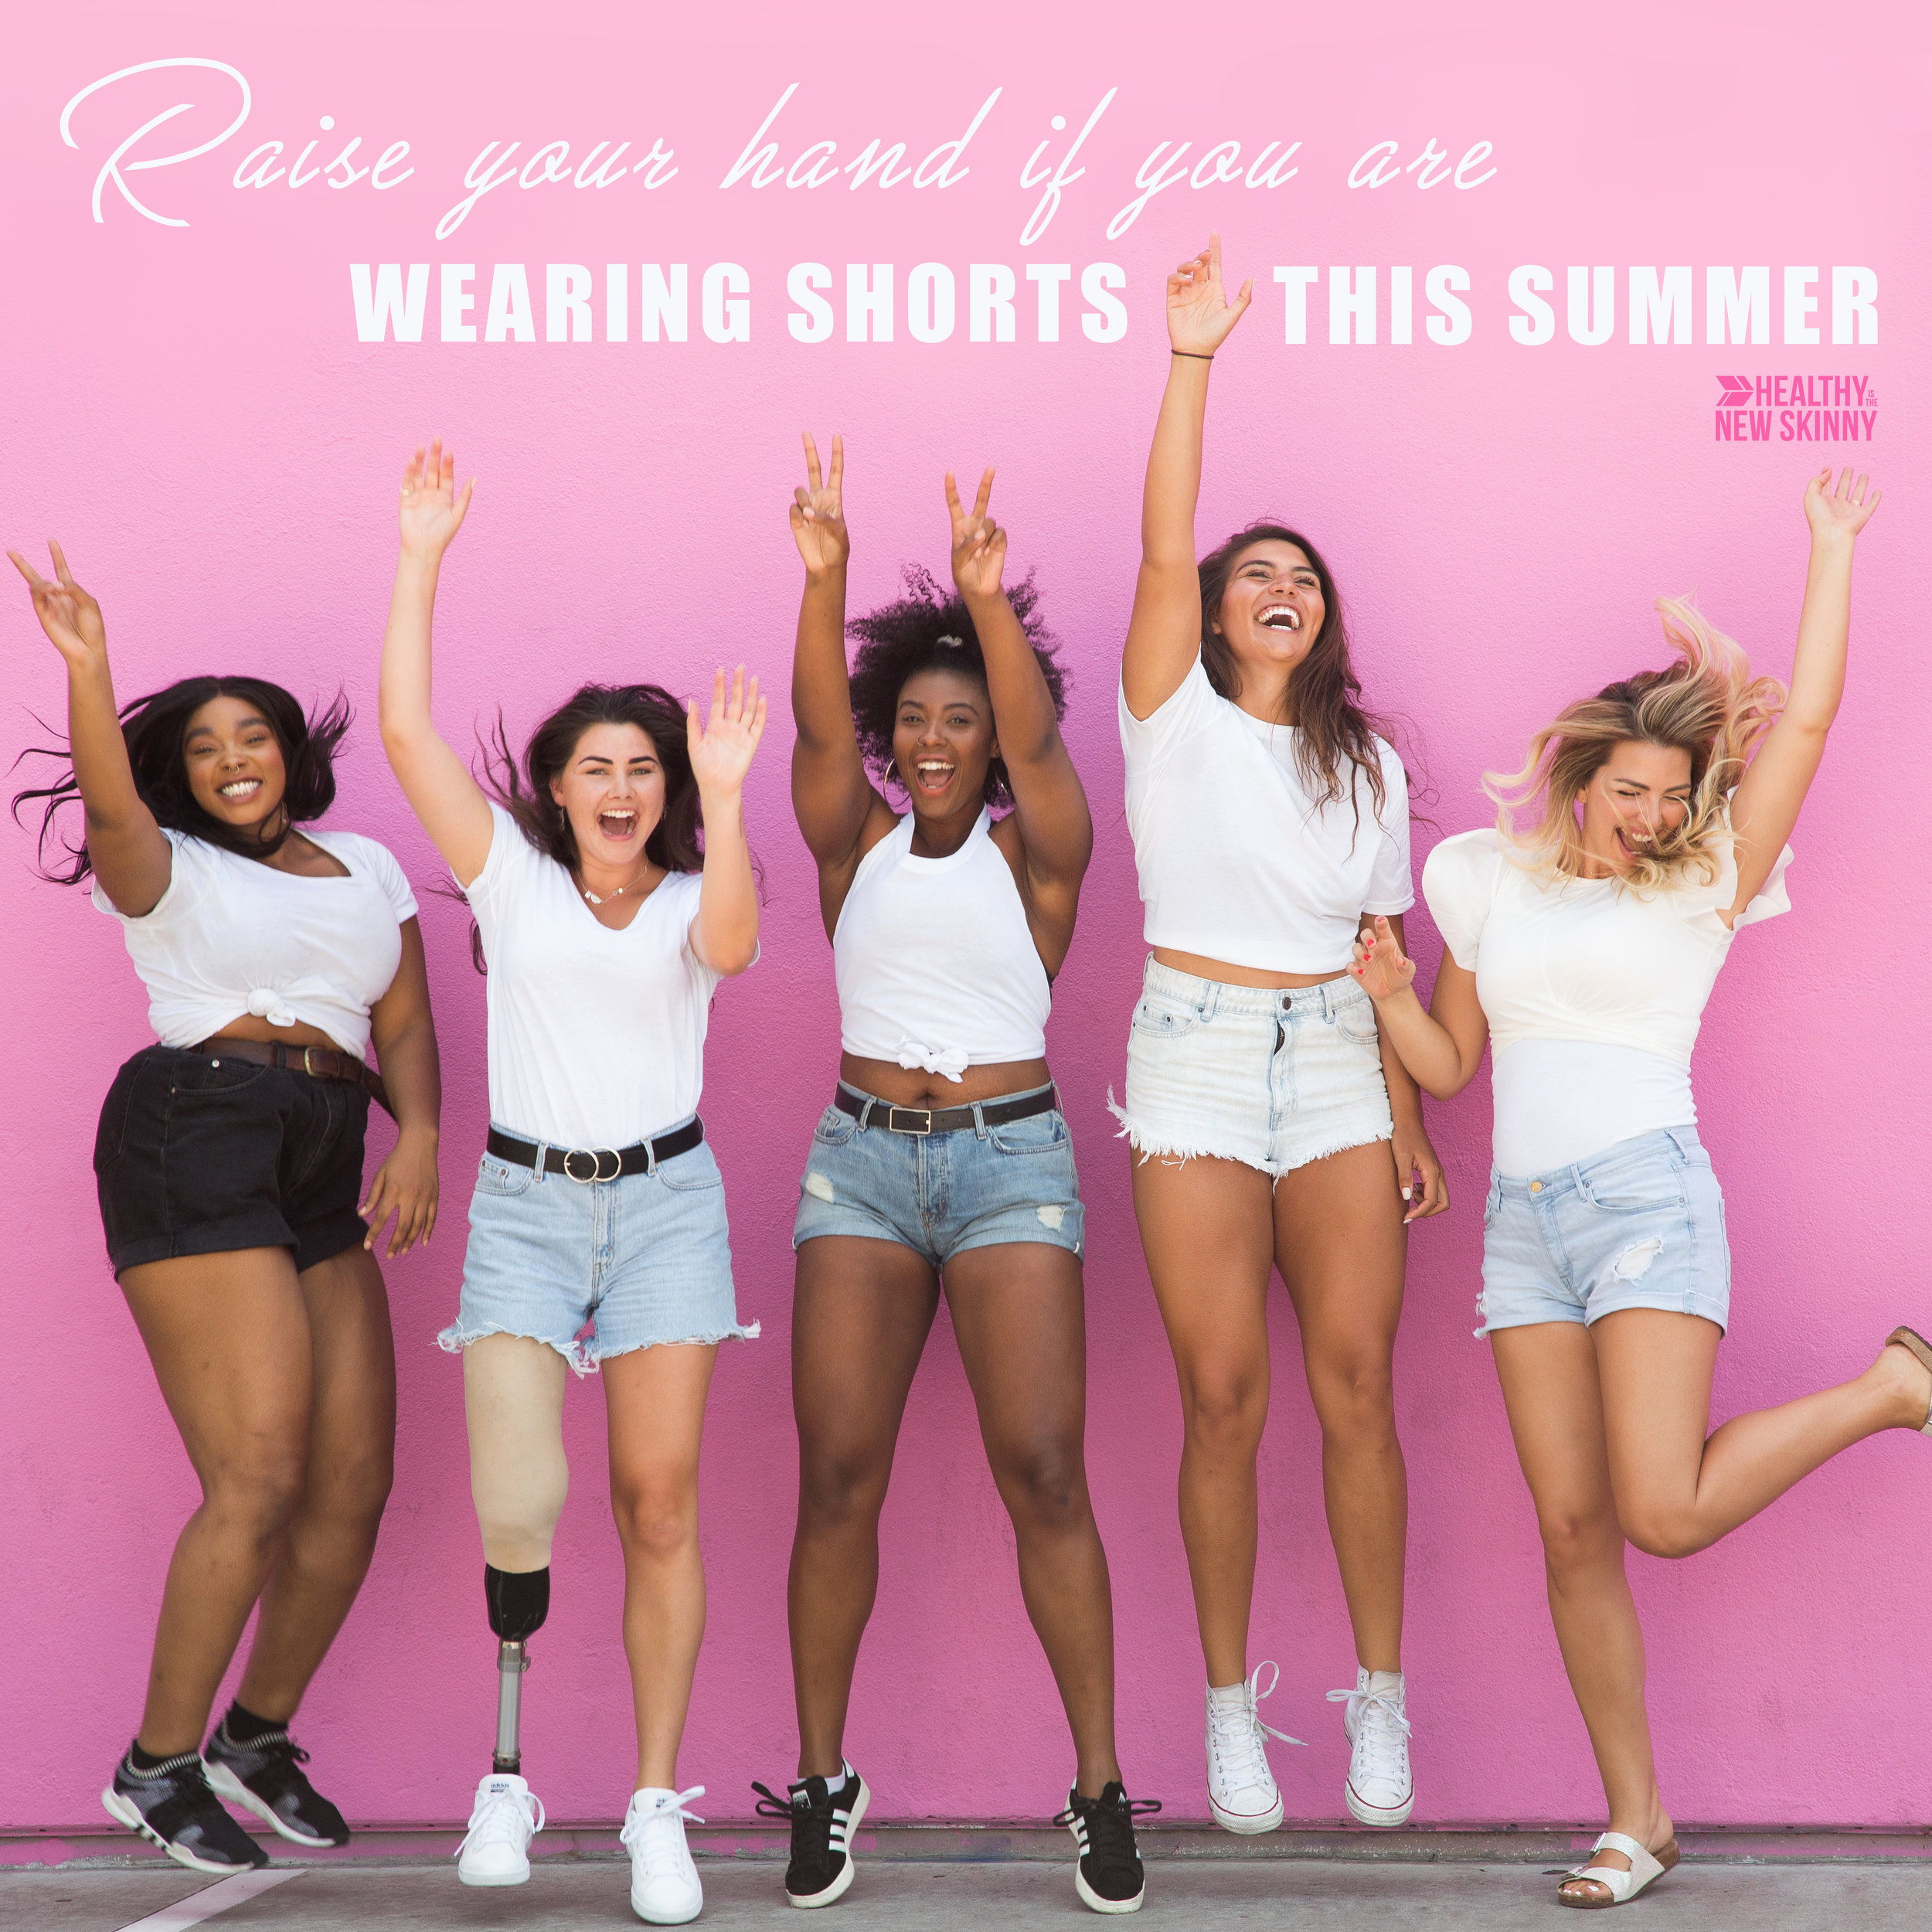 shorts IG.jpg